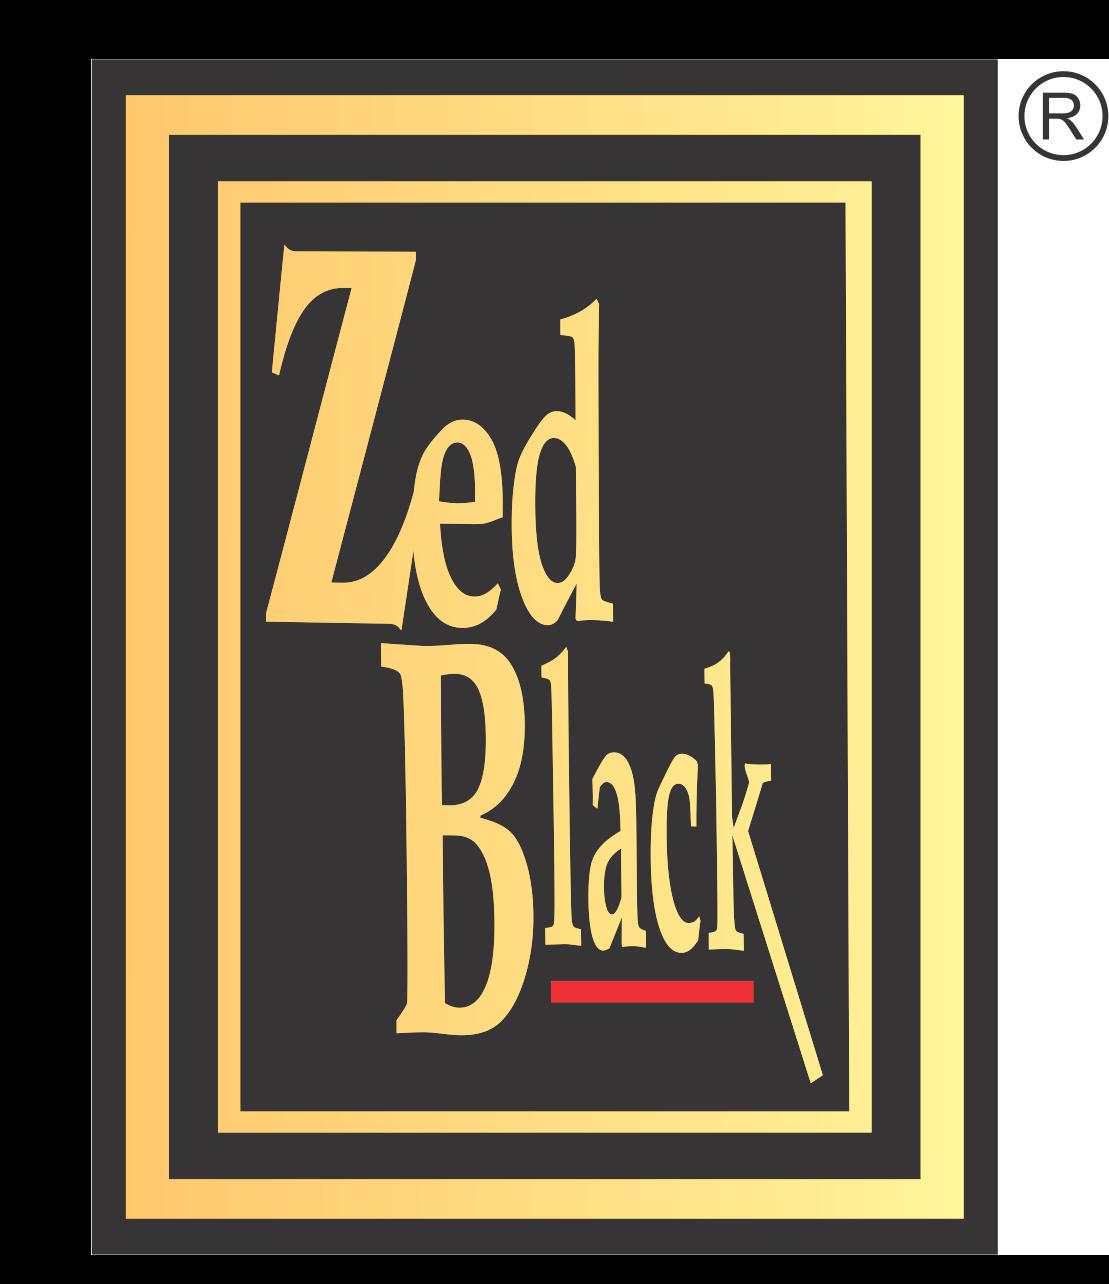 zed black small size logo